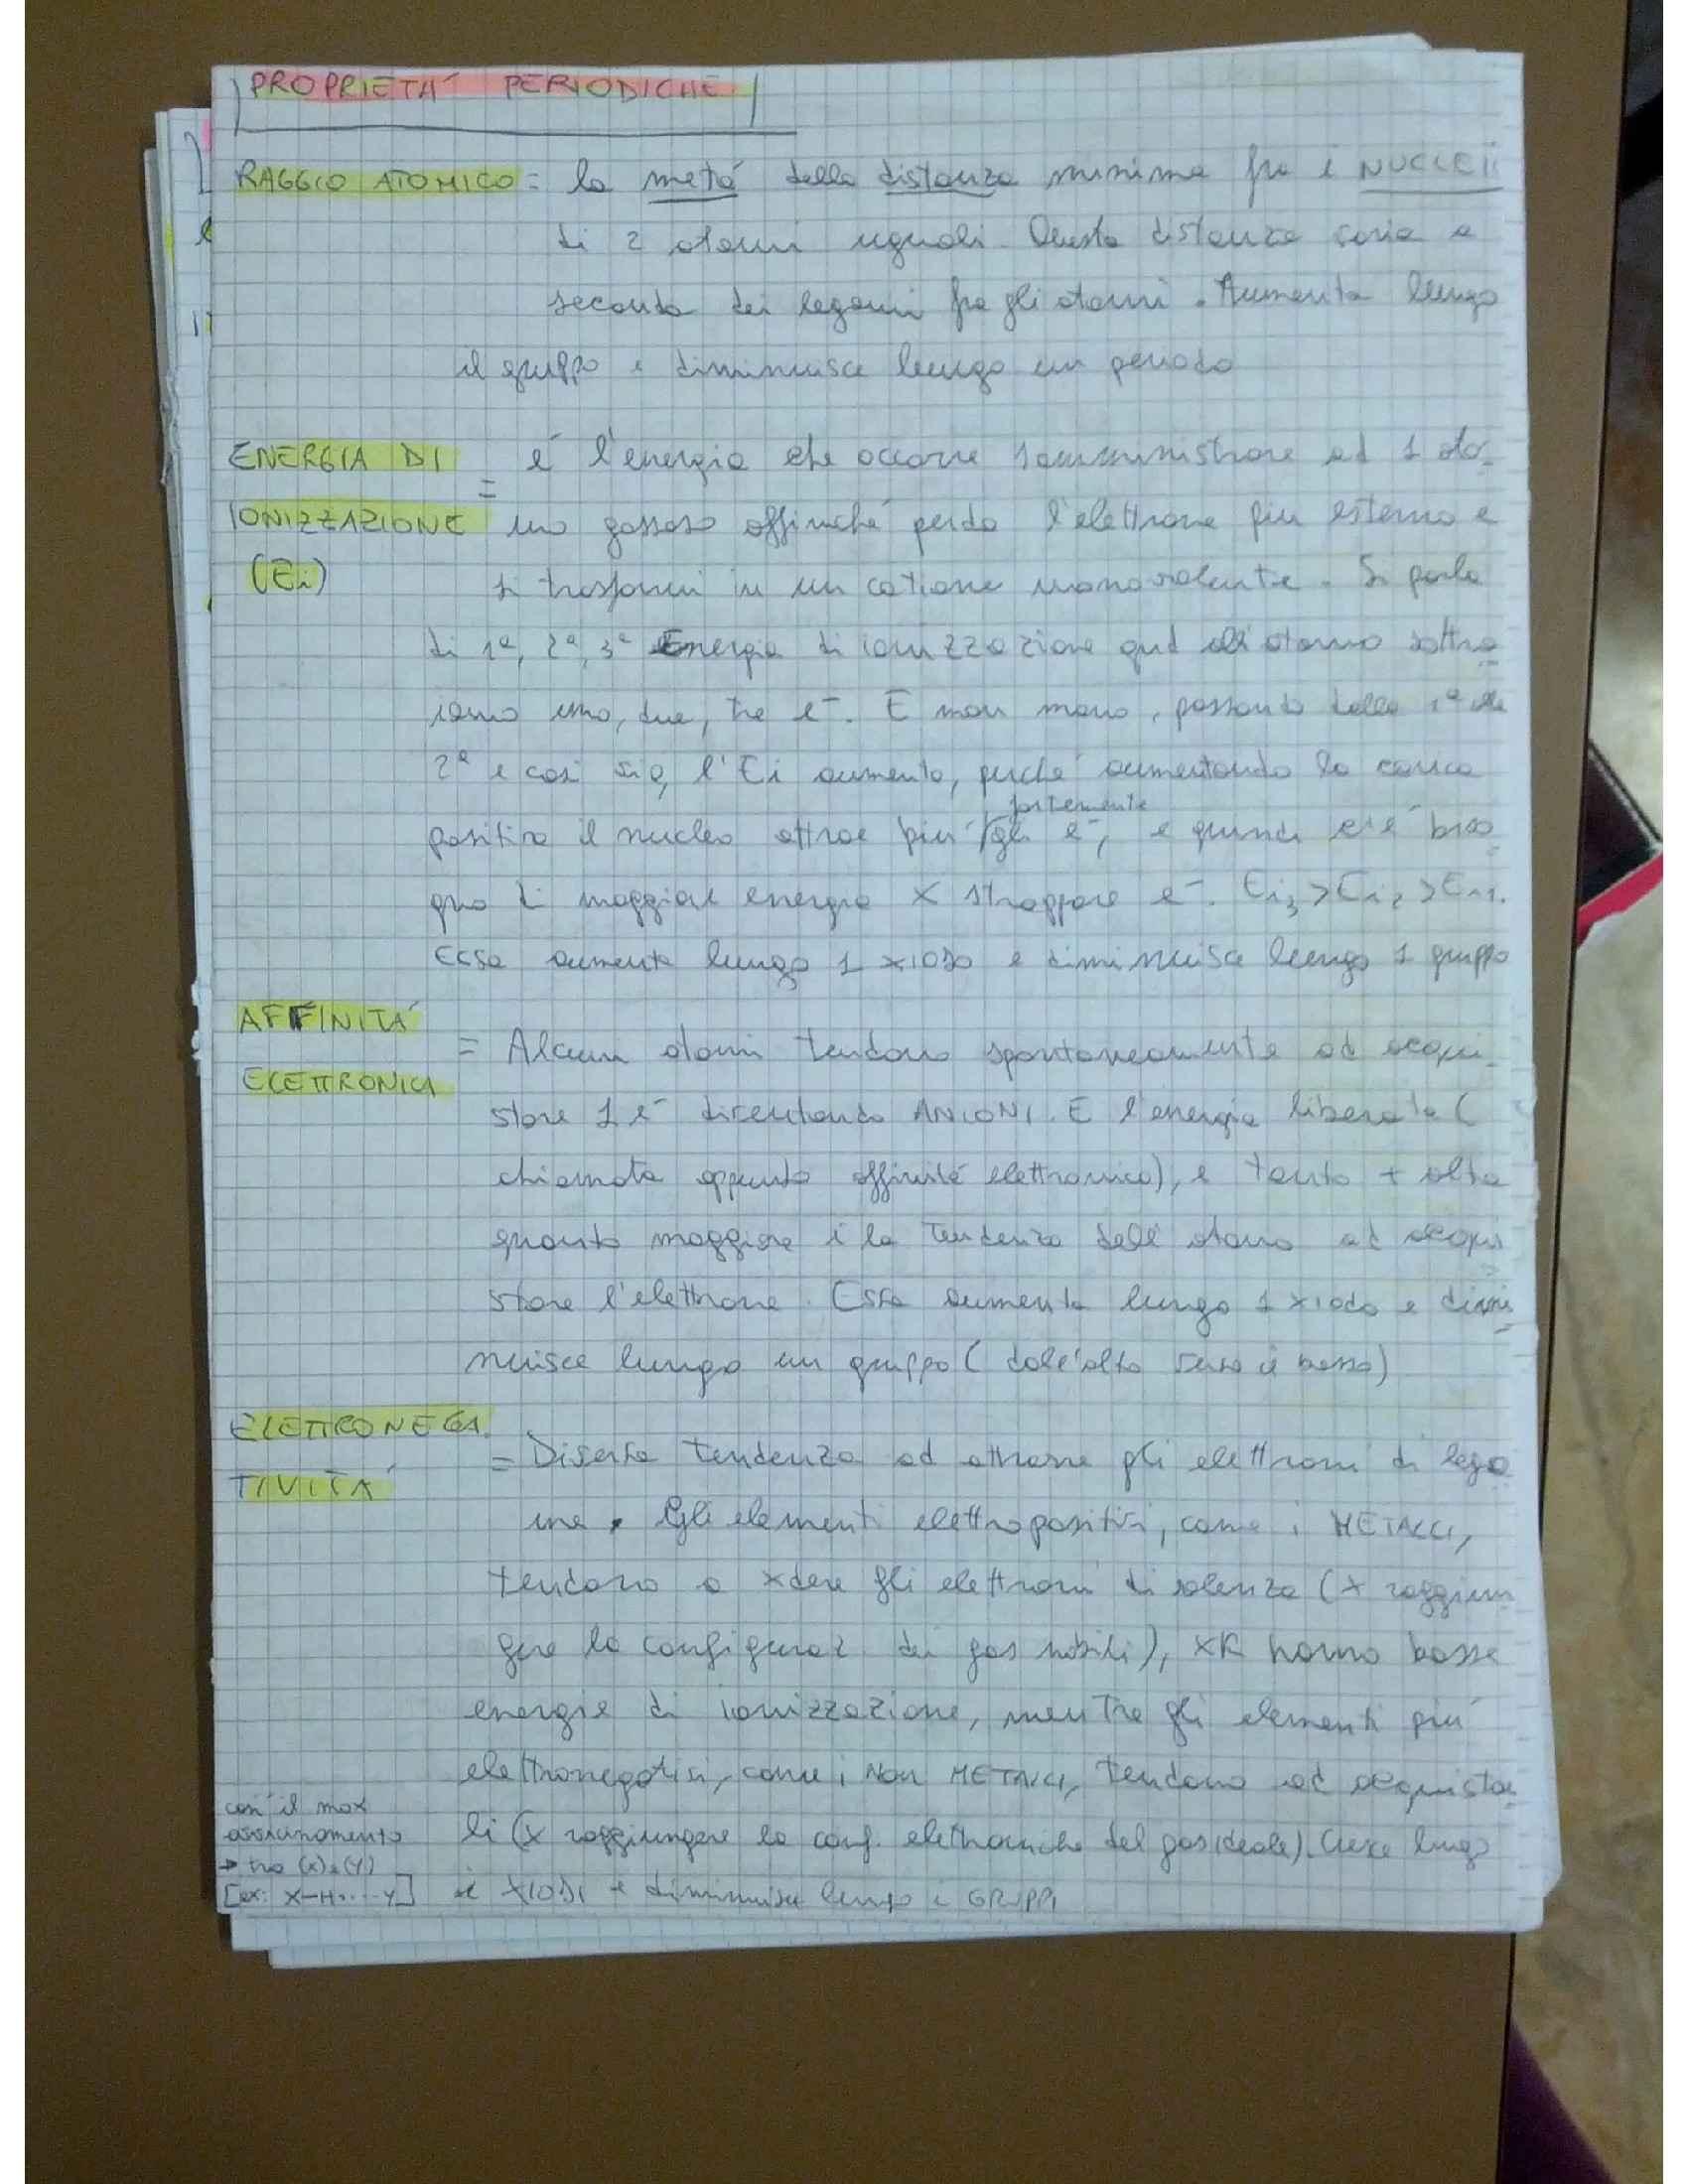 Chimica inorganica - Appunti